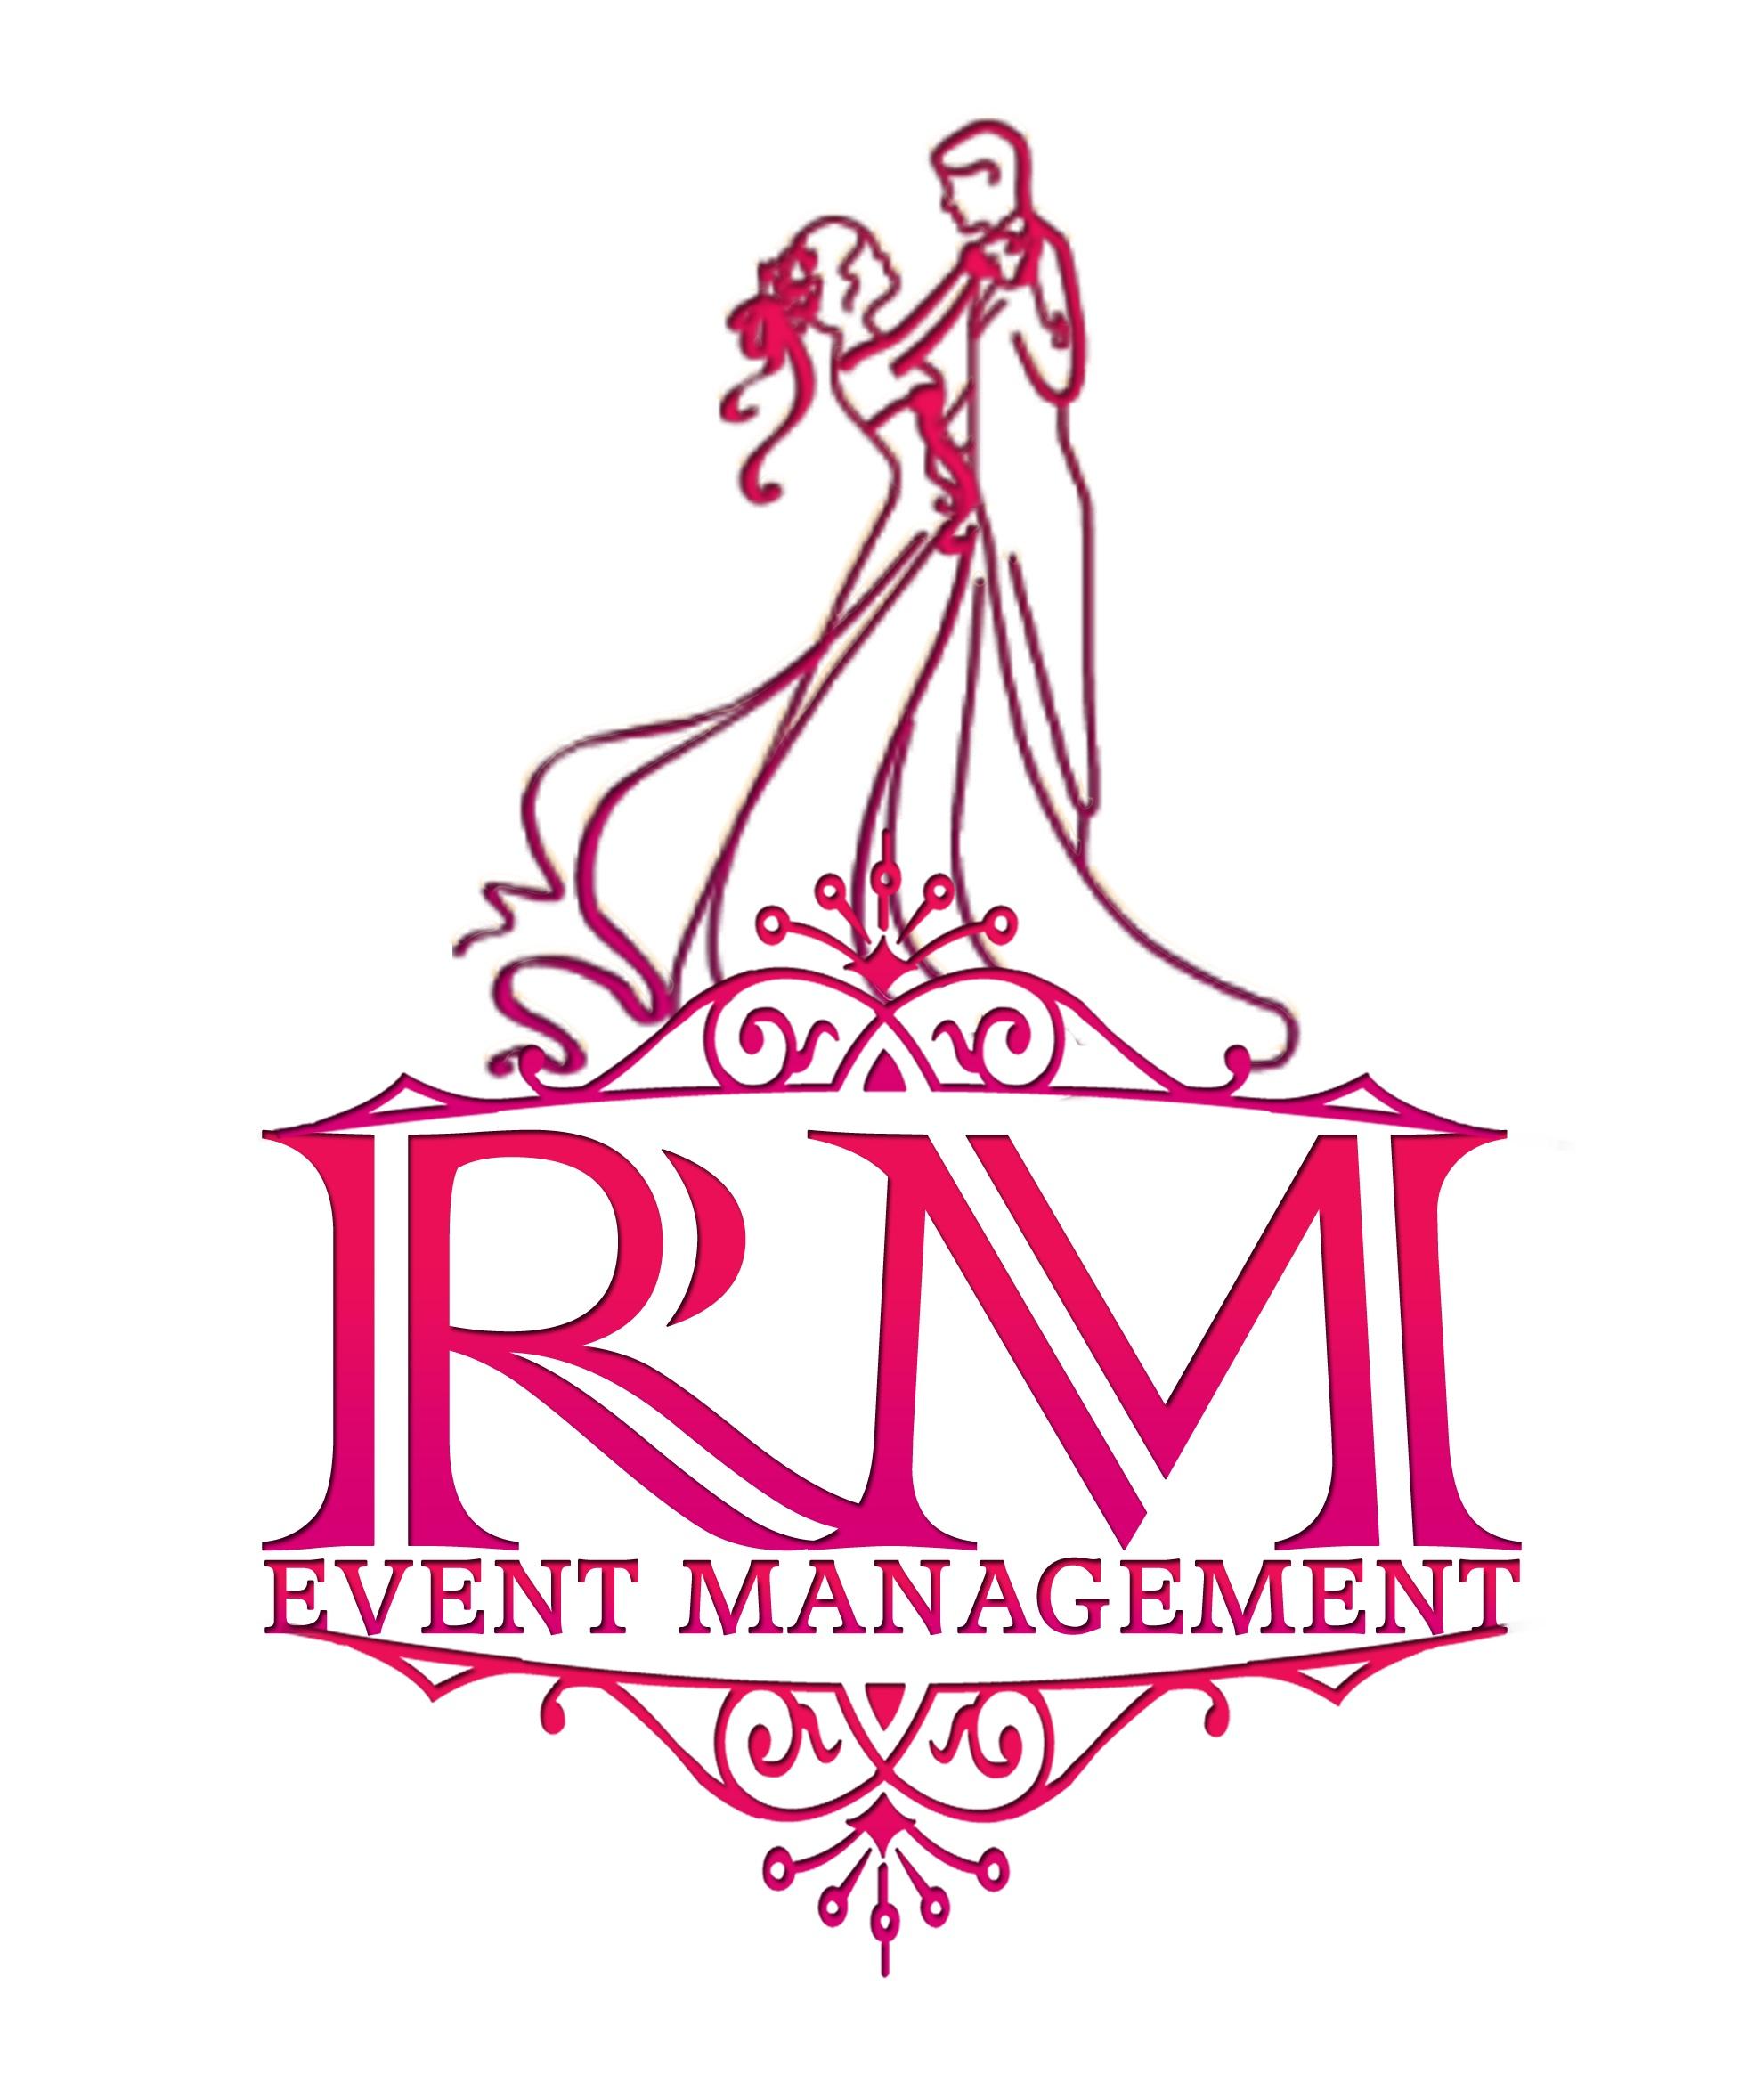 Rm event management